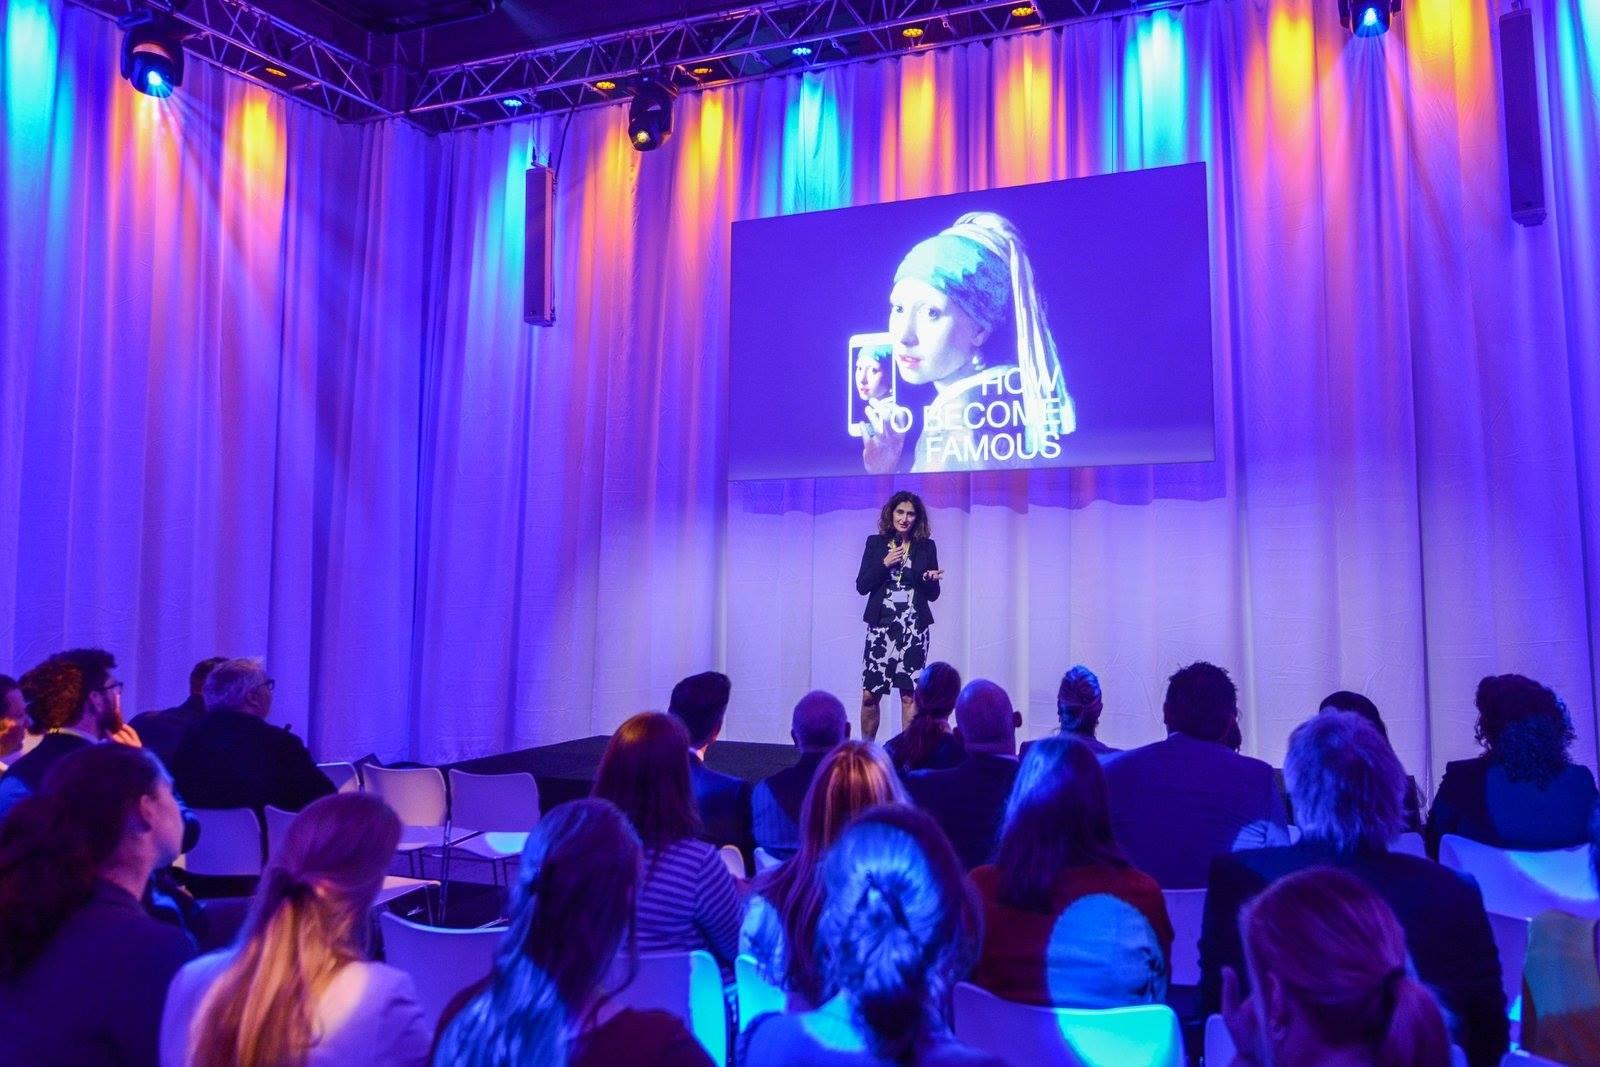 ACS-audiovisual-solutions-relatie-event-2016-11